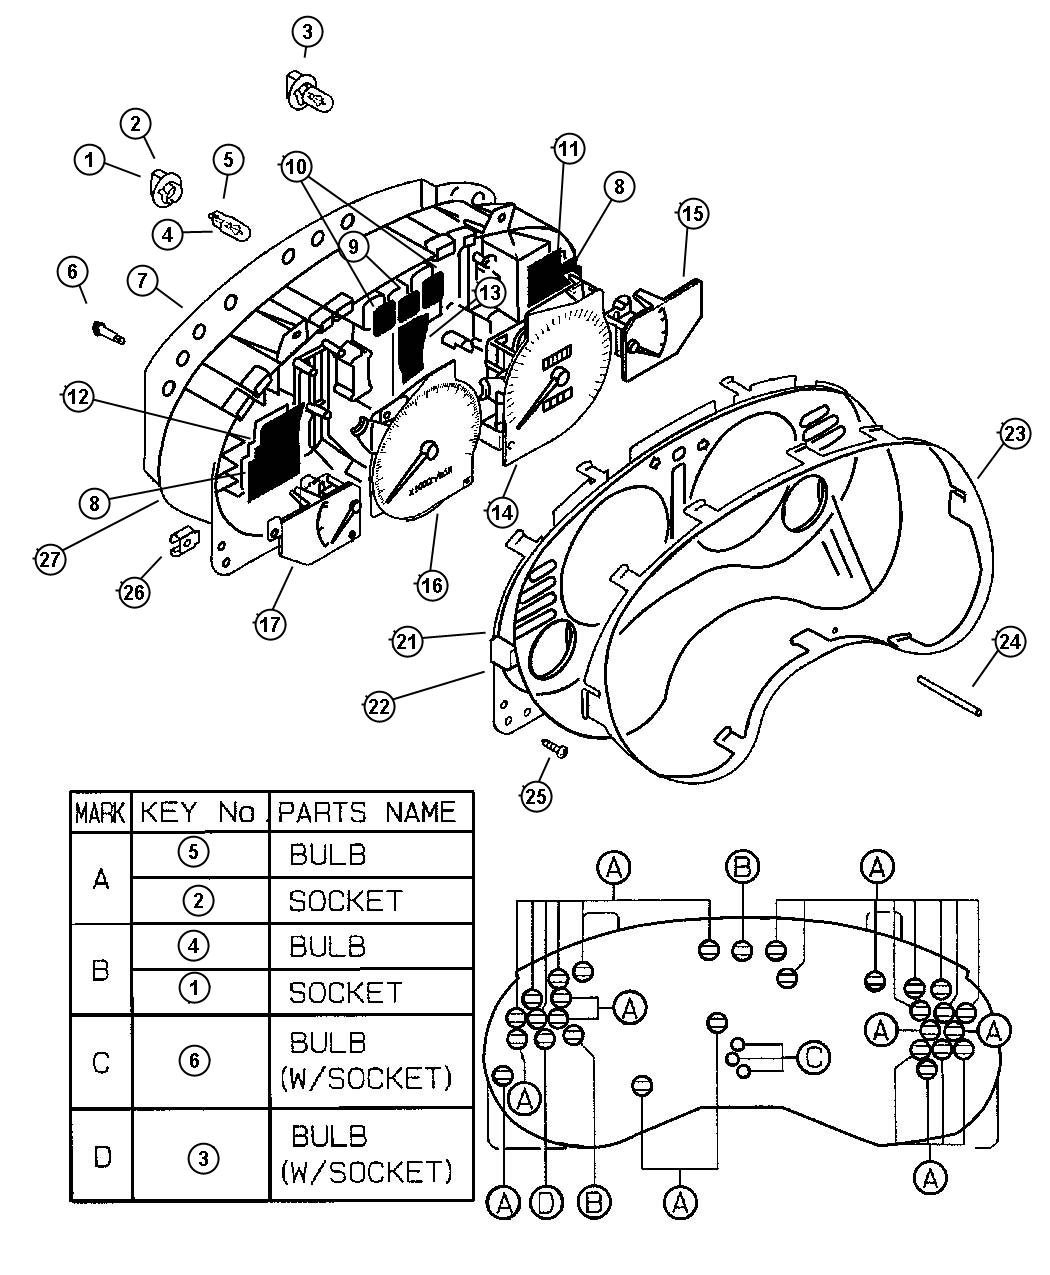 Chrysler Sebring Nut. Spring. Cluster, instrument, panel